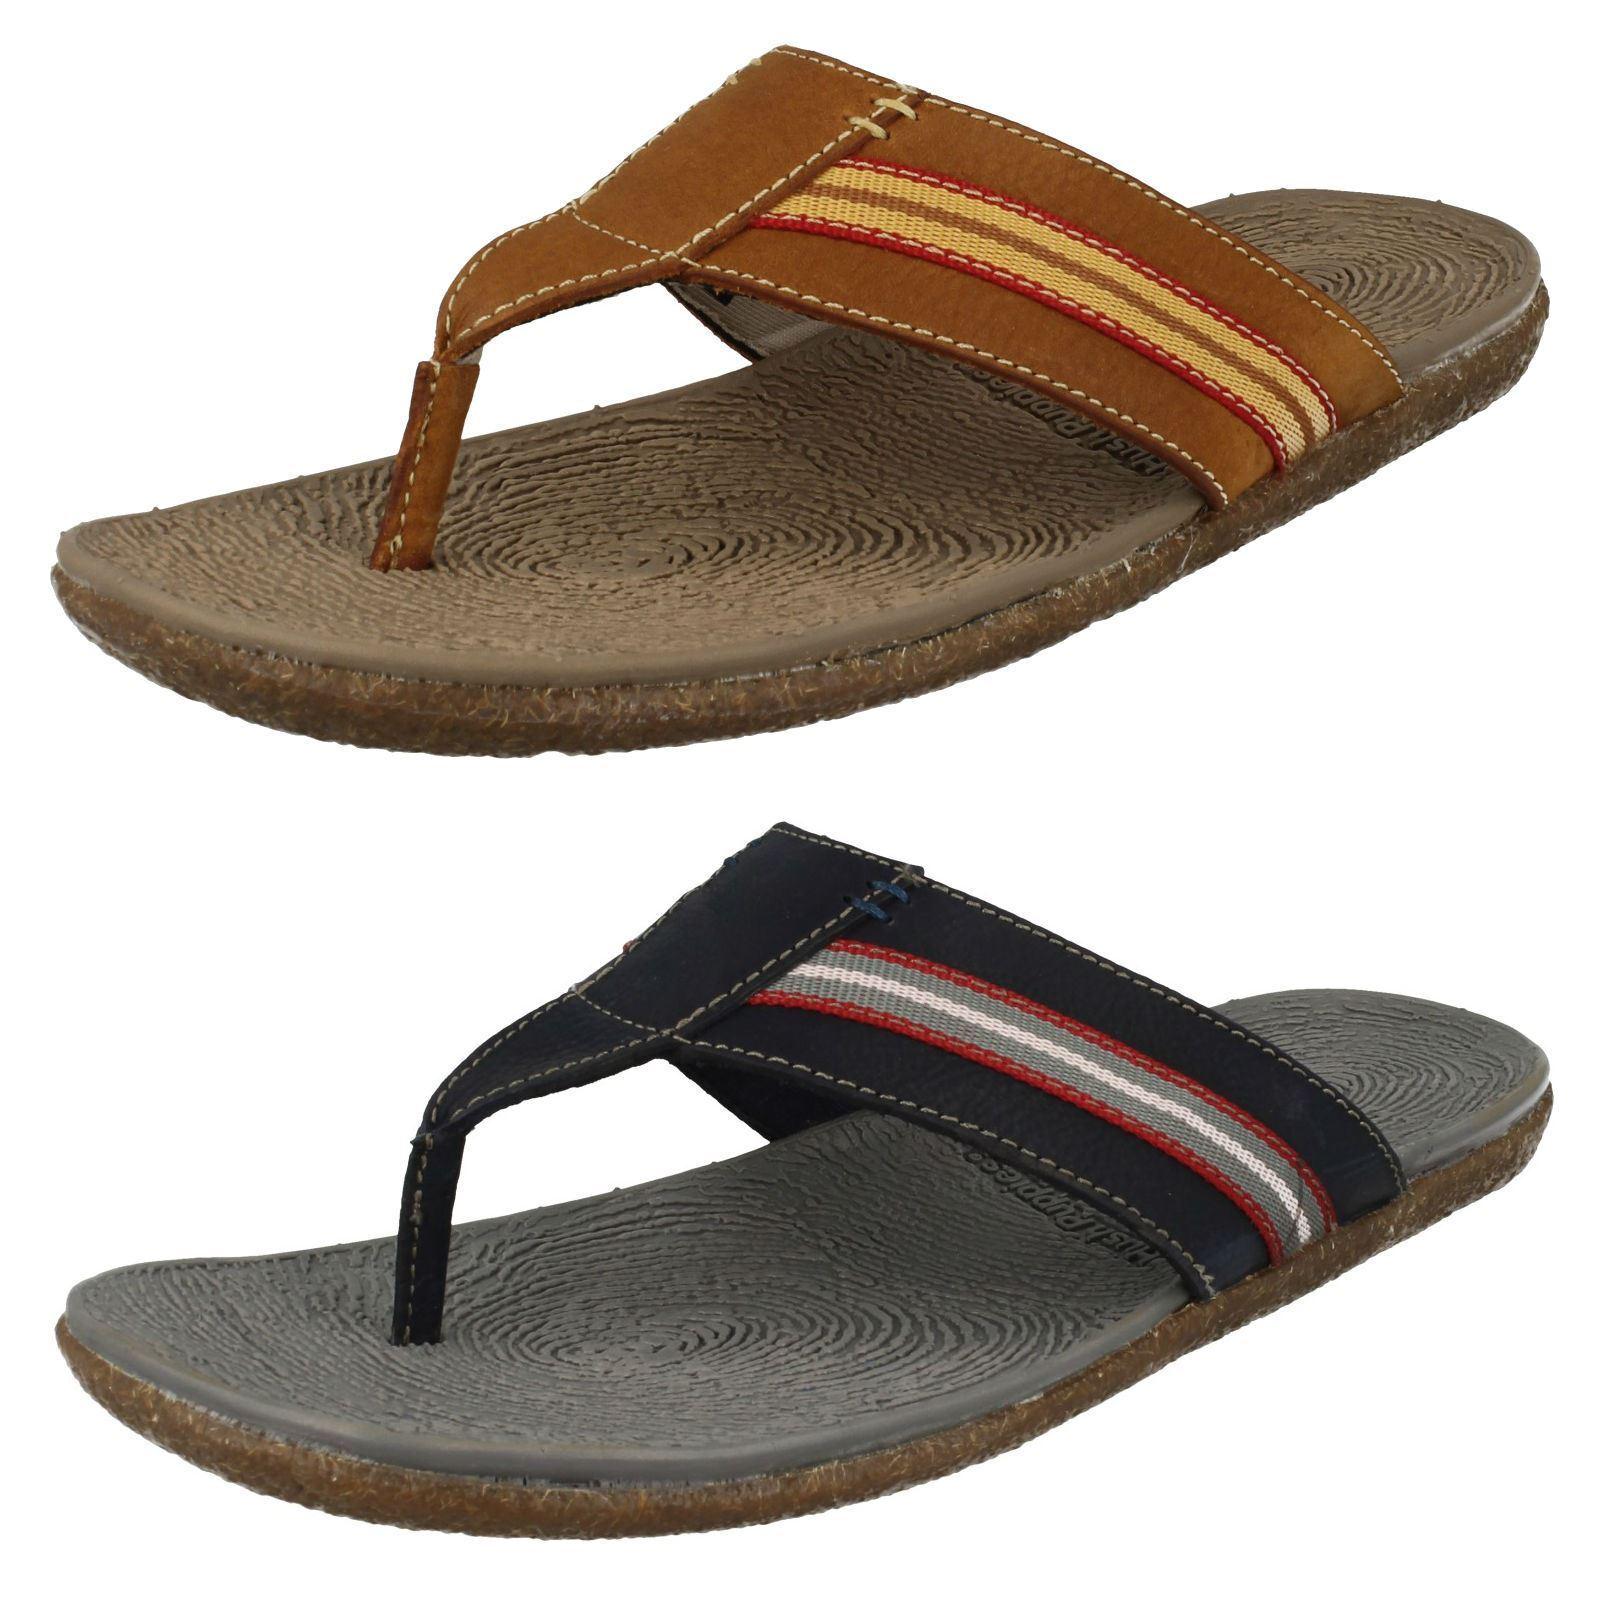 Mens Hush Puppies Slip On Summer Sandals Frame Toe Post